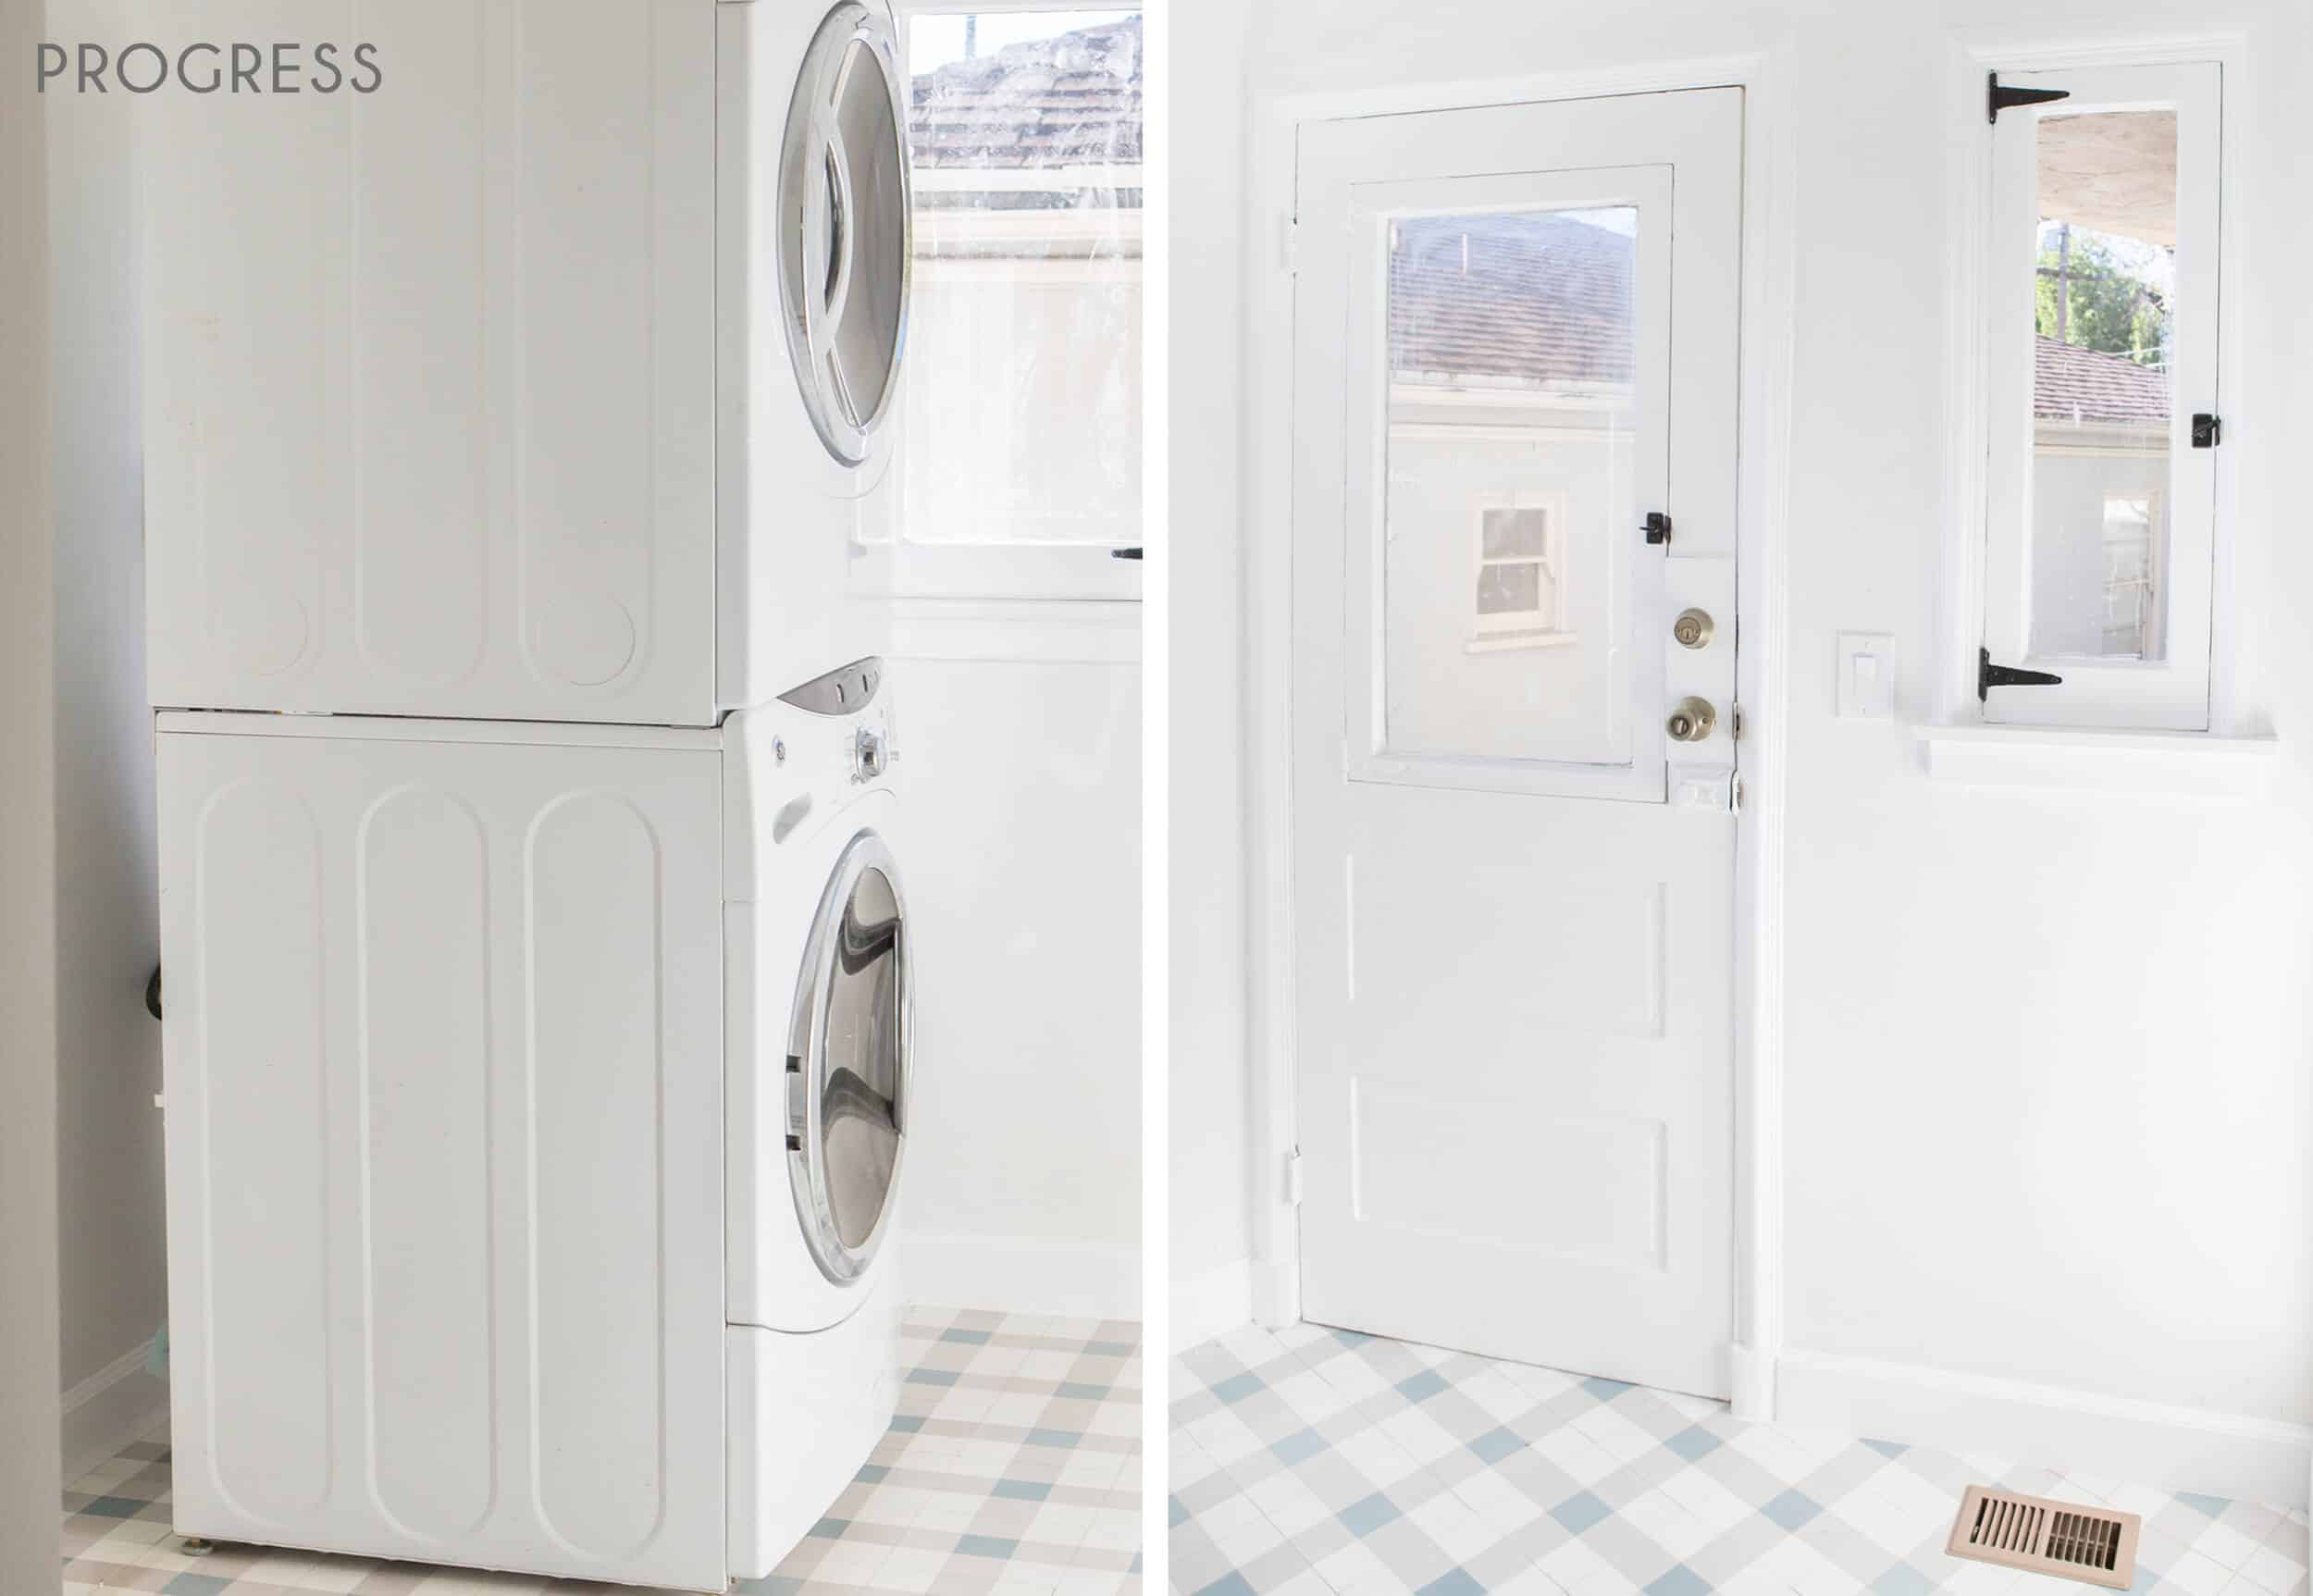 Emily-Henderson_Home_English-Tudor_Modern_Laundry-Room_Side-by-Side_Progress